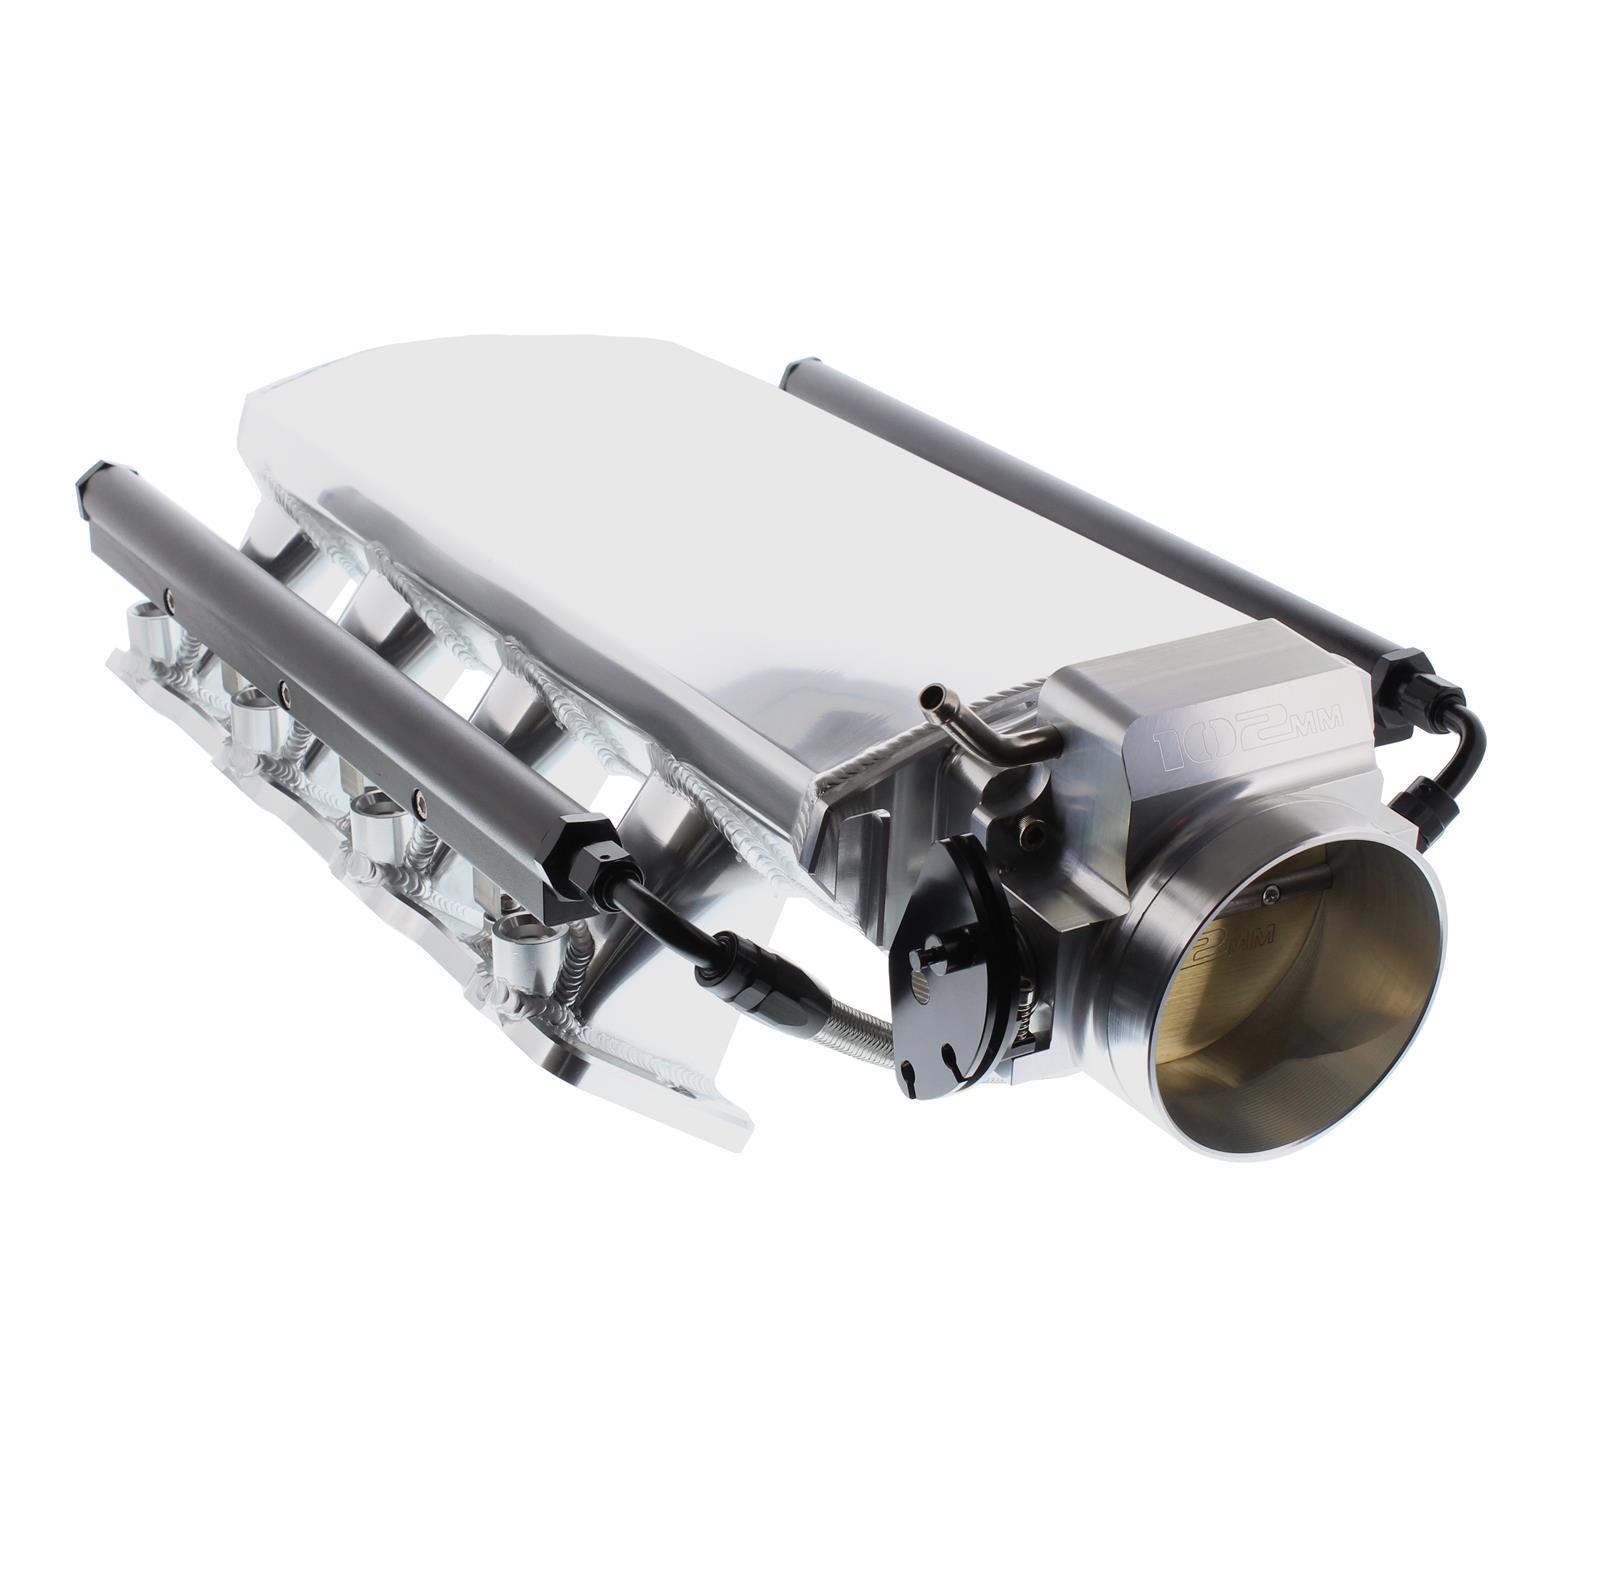 Summit Racing® Fabricated Intake Manifolds SUM-226129-K